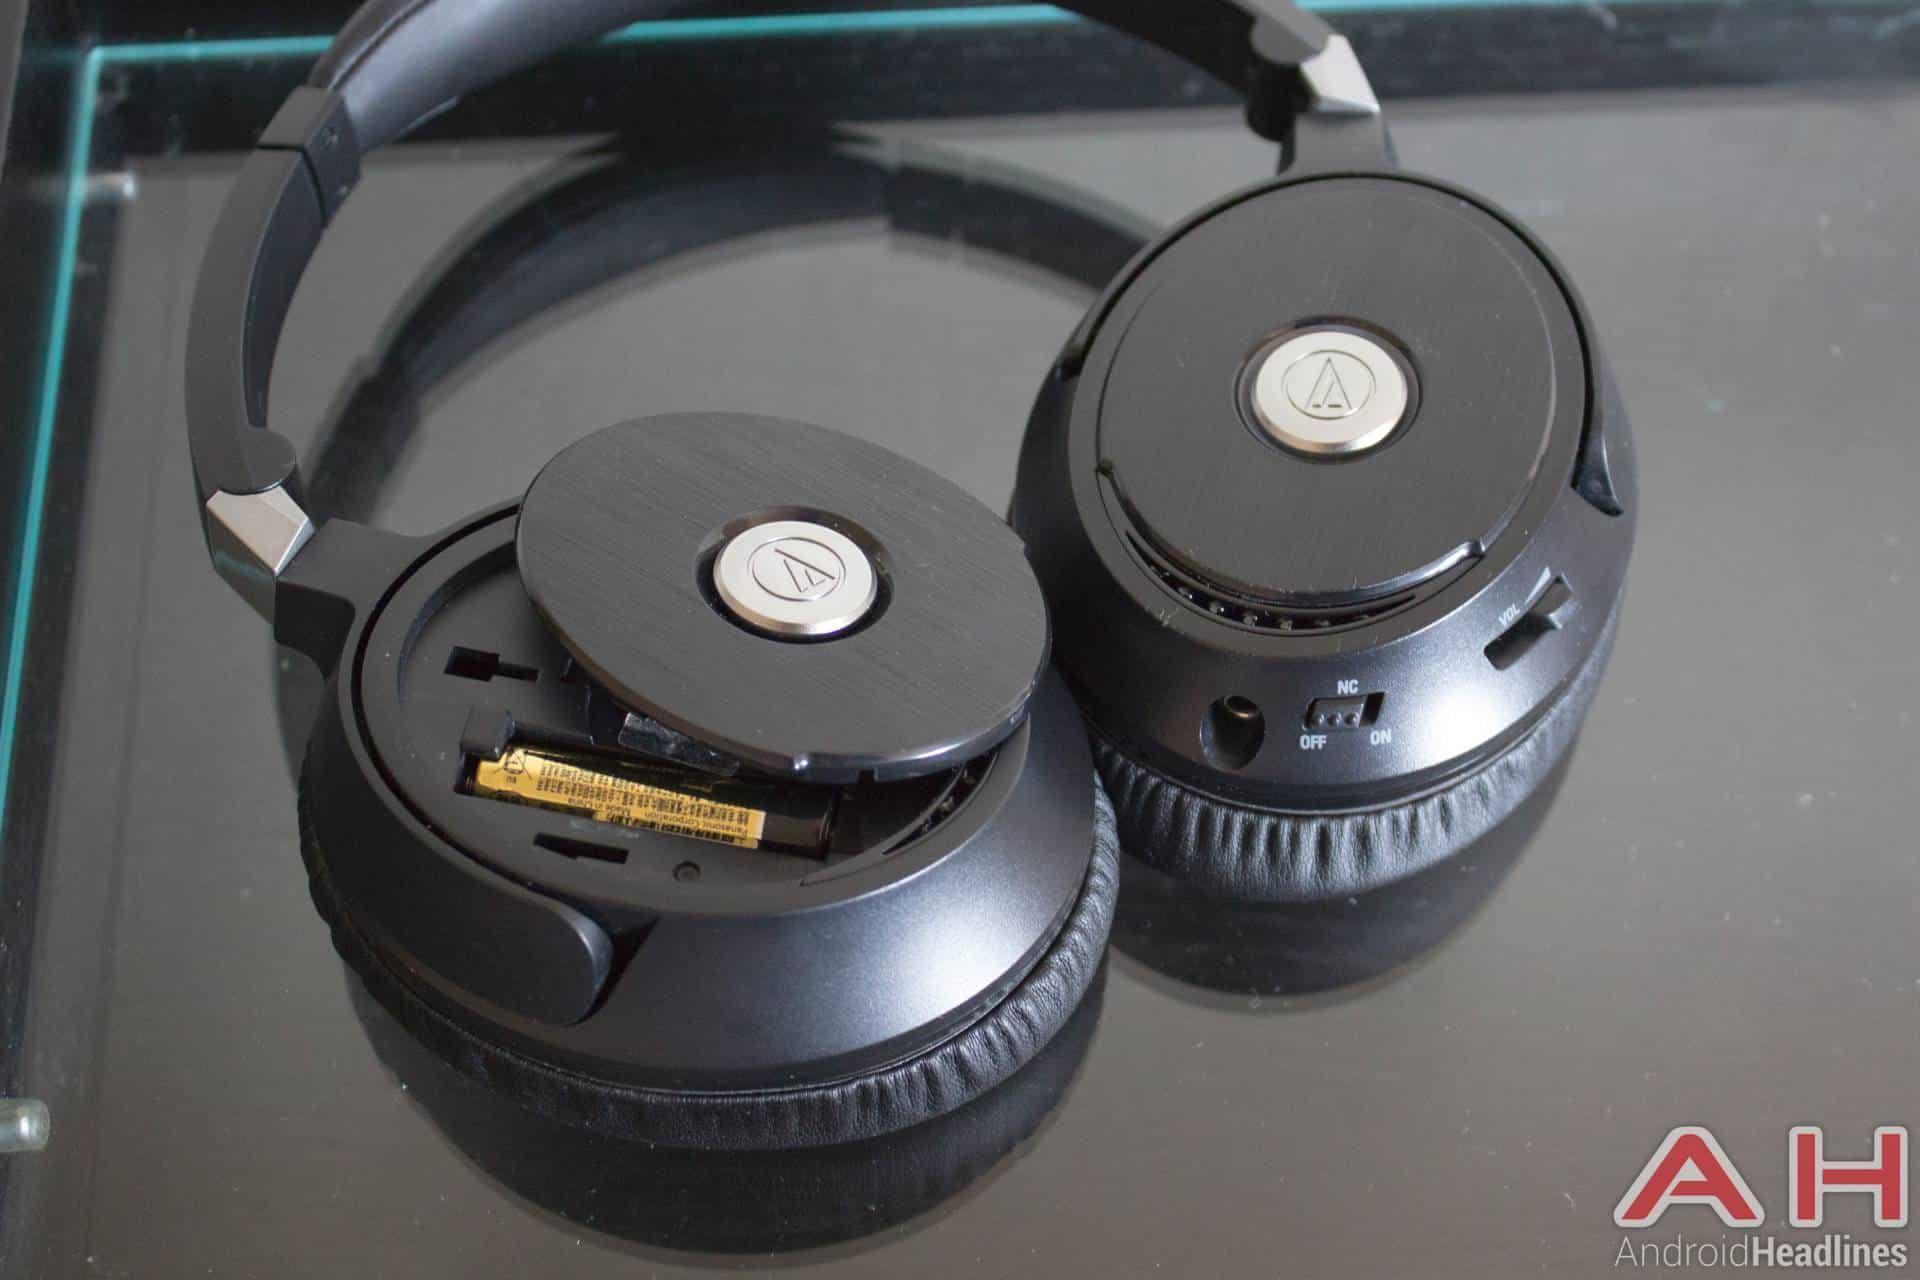 Audiotechnica-ANC70-AH-NS-03